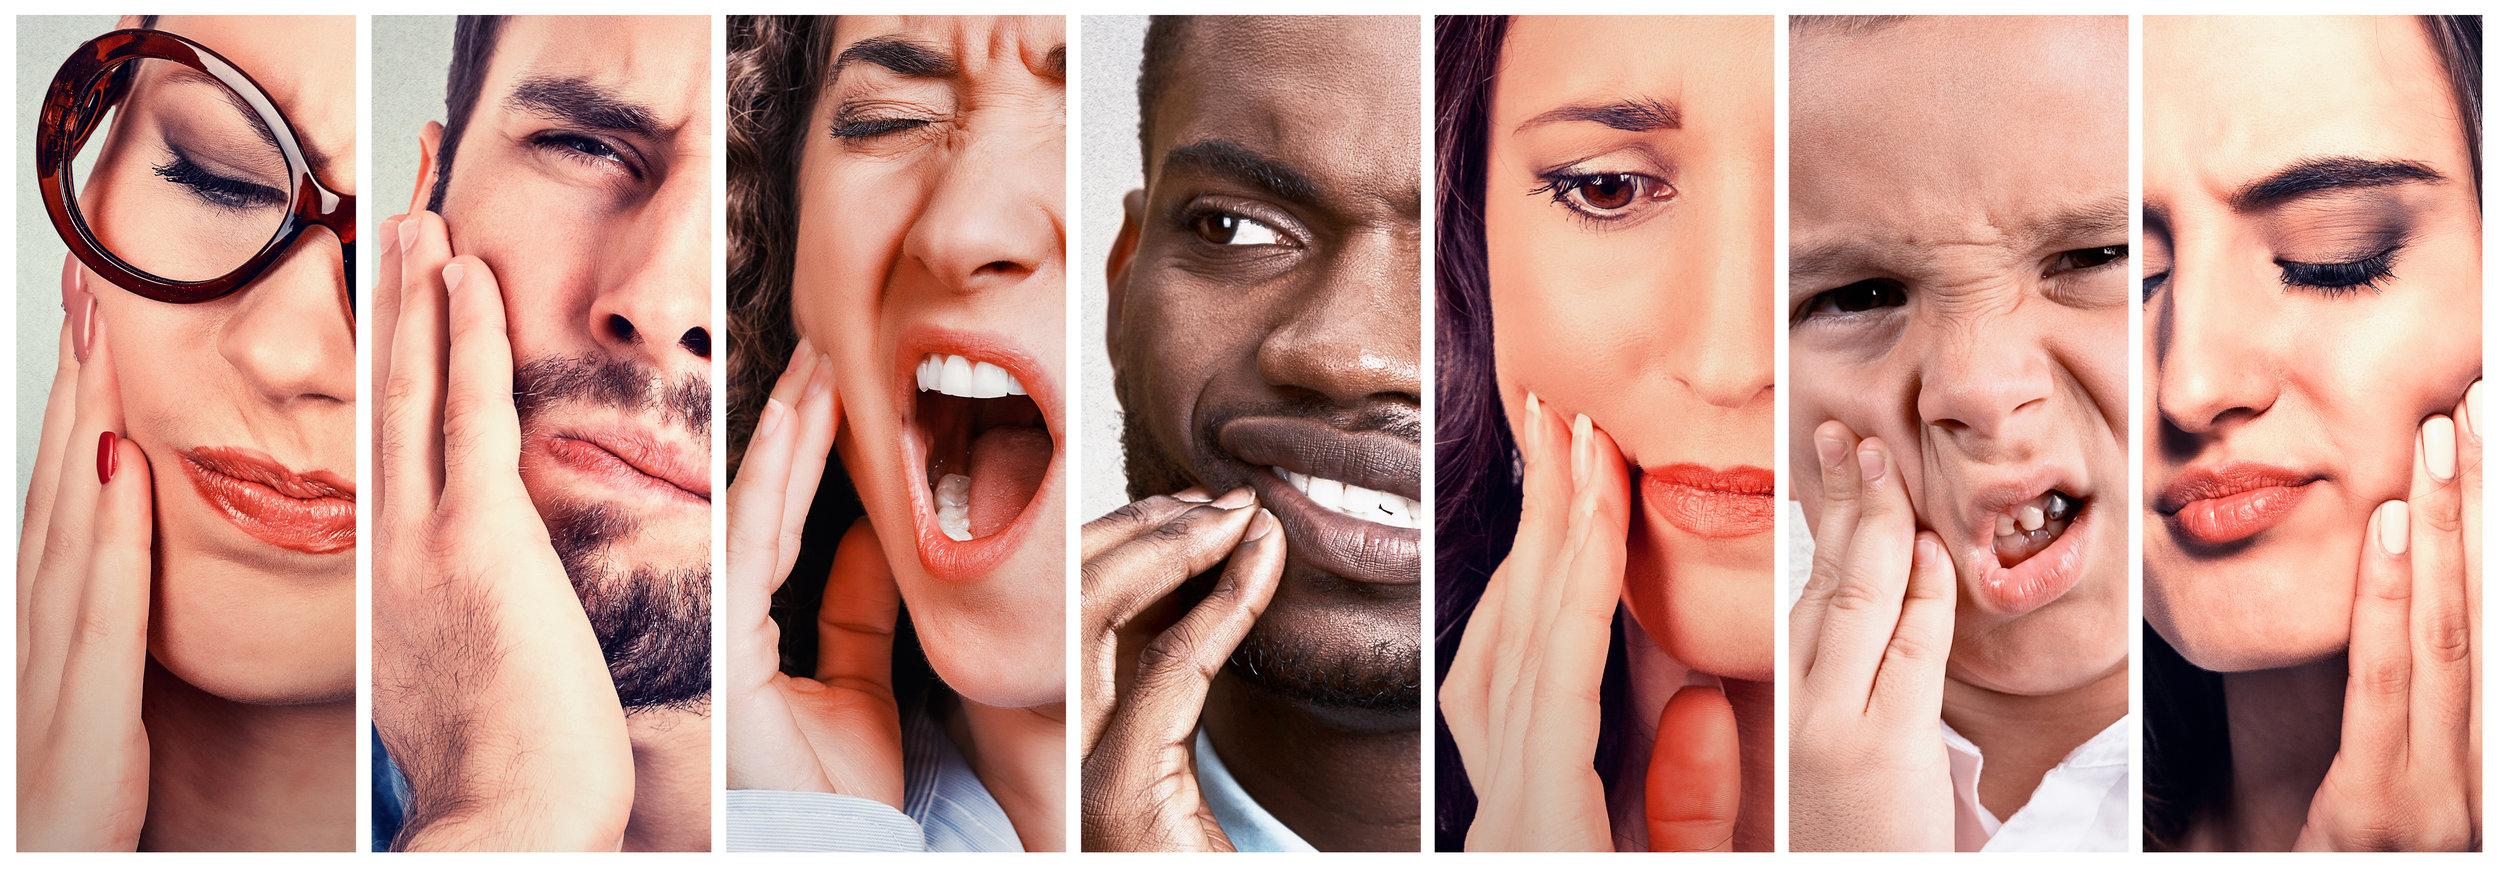 wisdom teeth removal charlotte nc best dentist